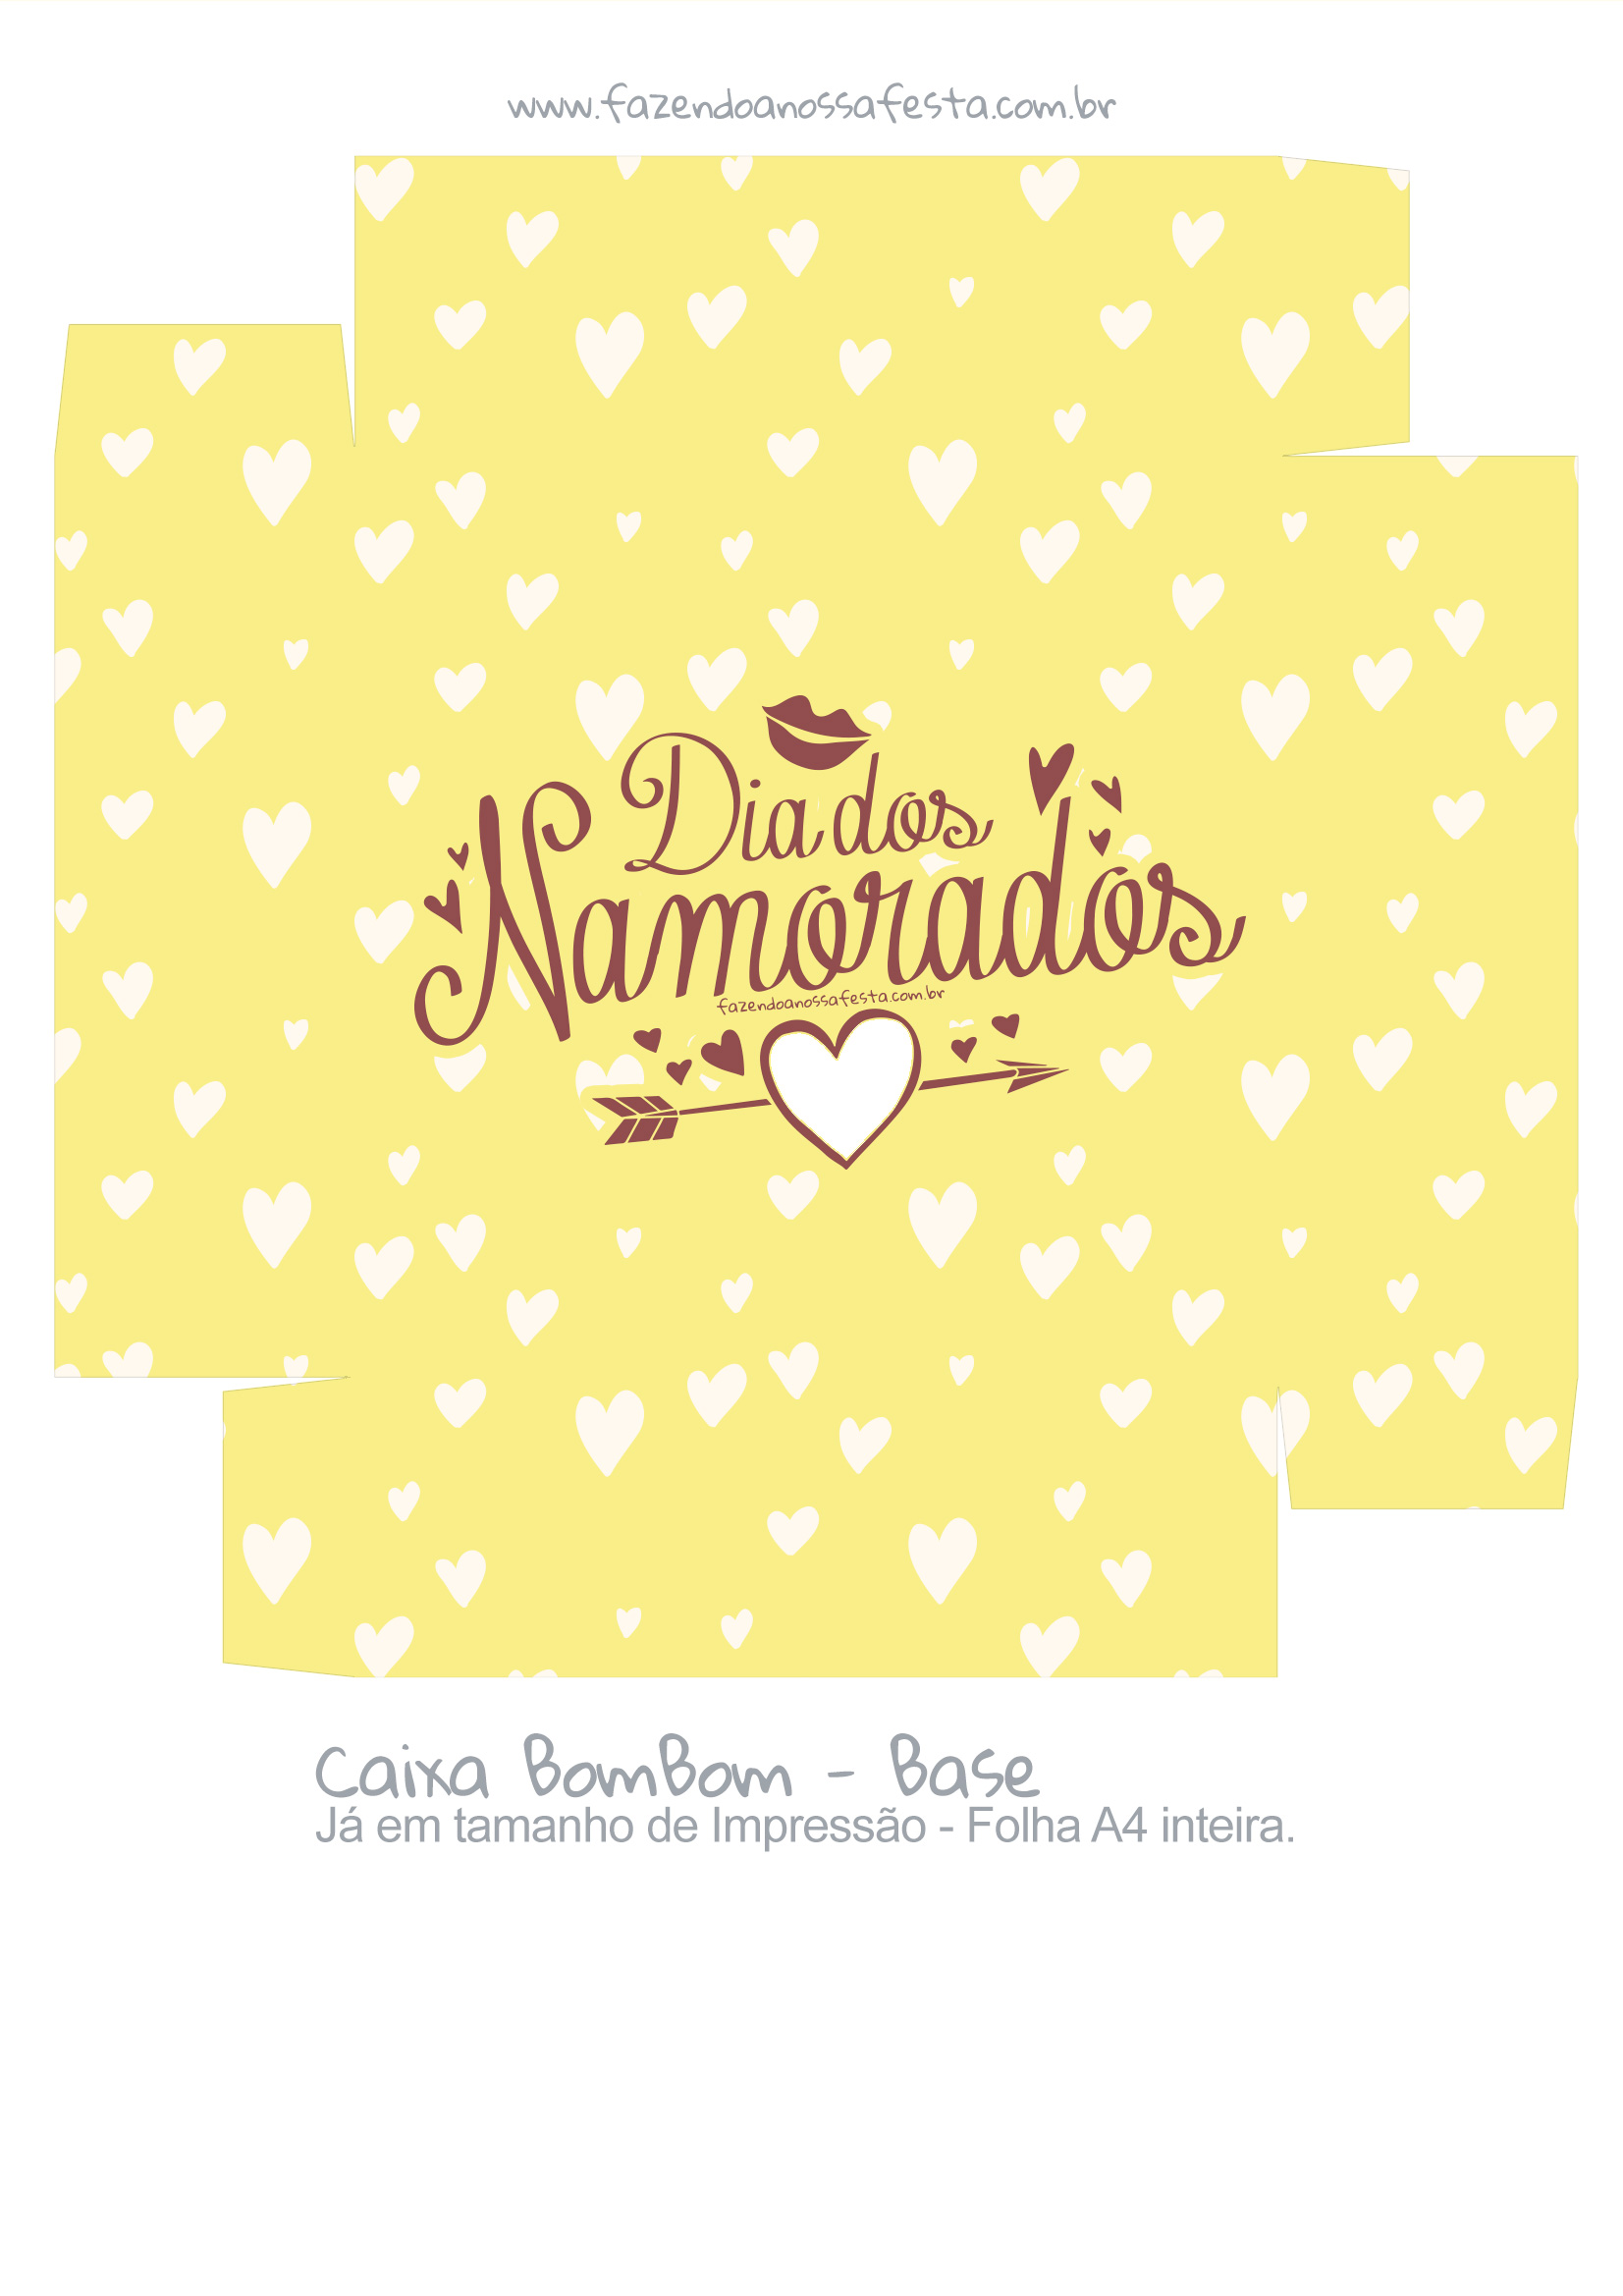 Caixa bombom dia dos Namorados Coracao Amarelo - parte 2